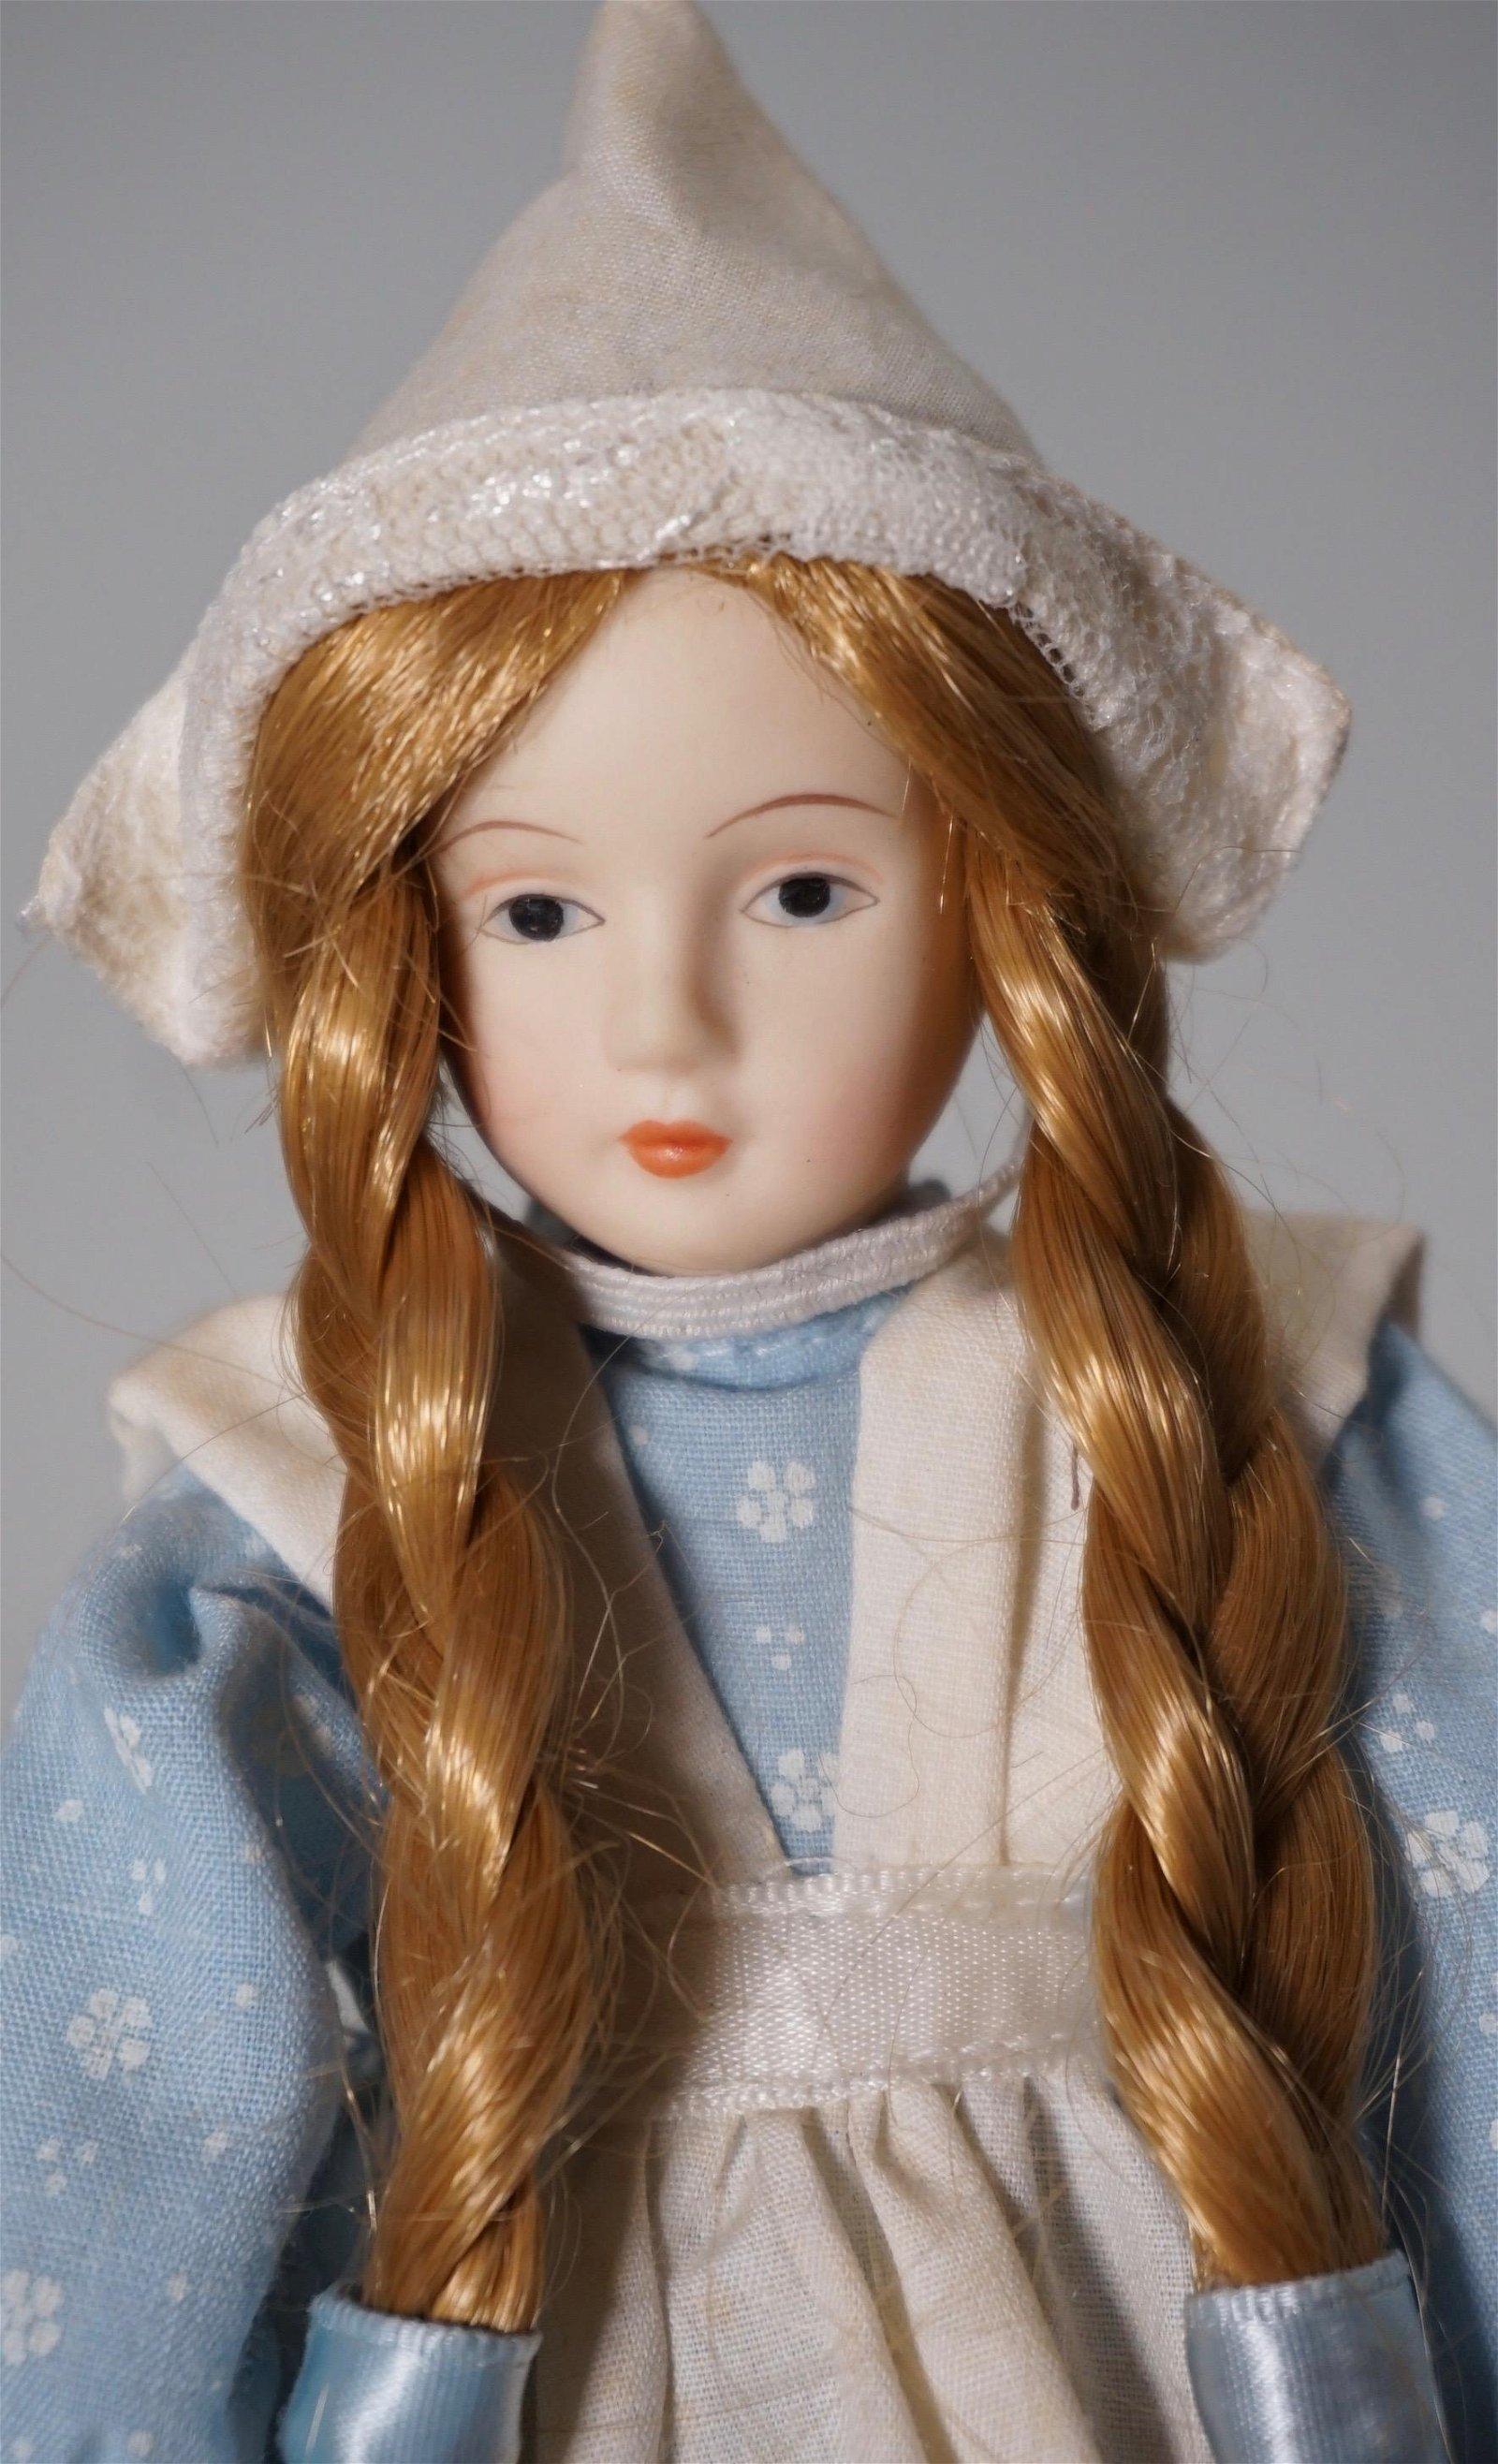 Vintage Porcelain Bonnet Doll